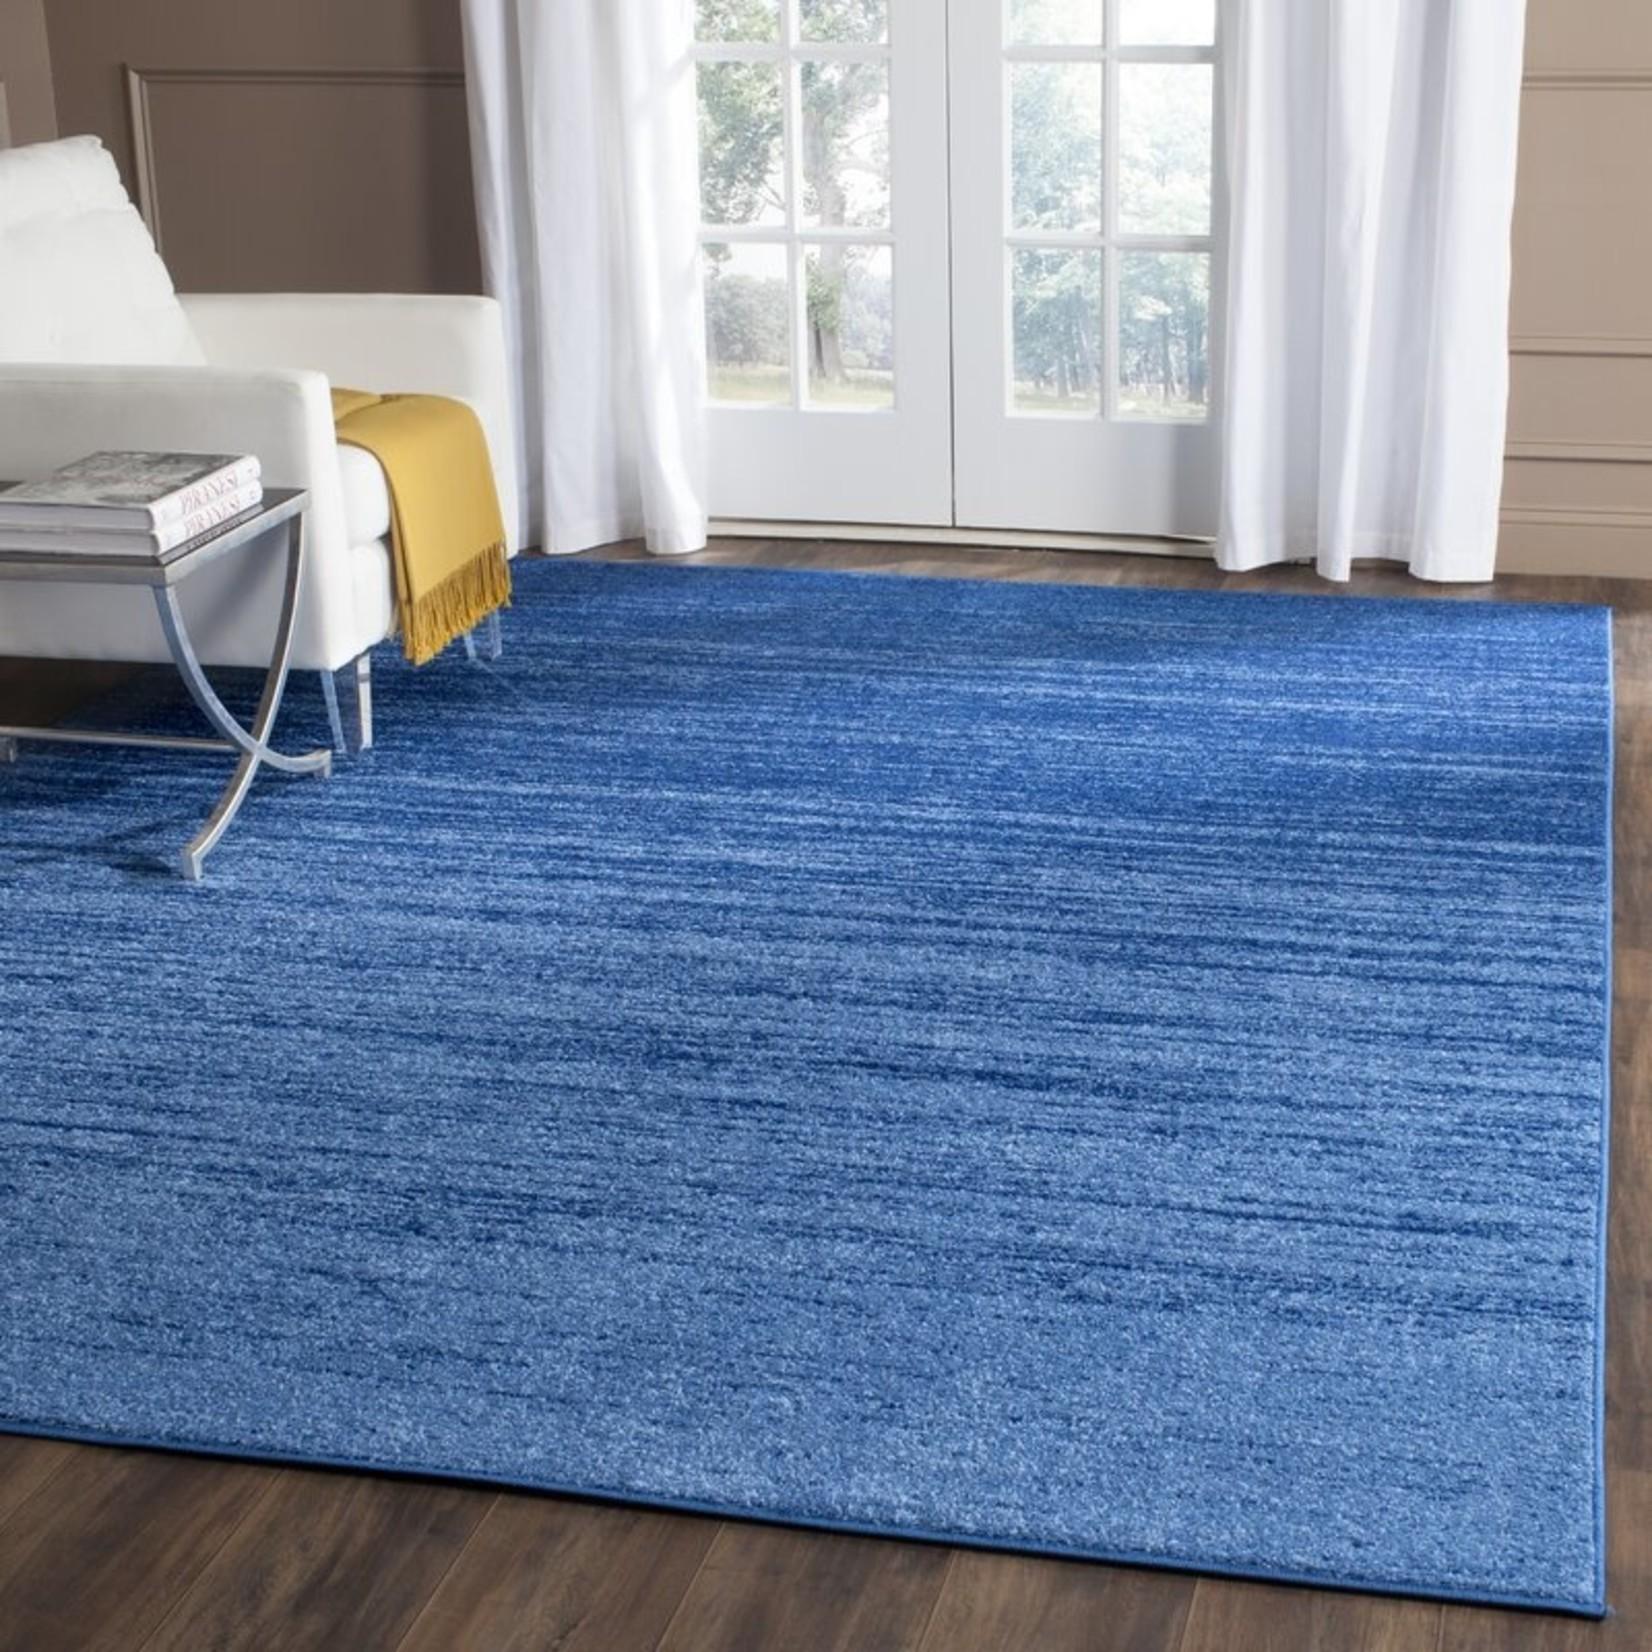 *4' x 6' - Lauren Light Blue/Dark Blue Area Rug